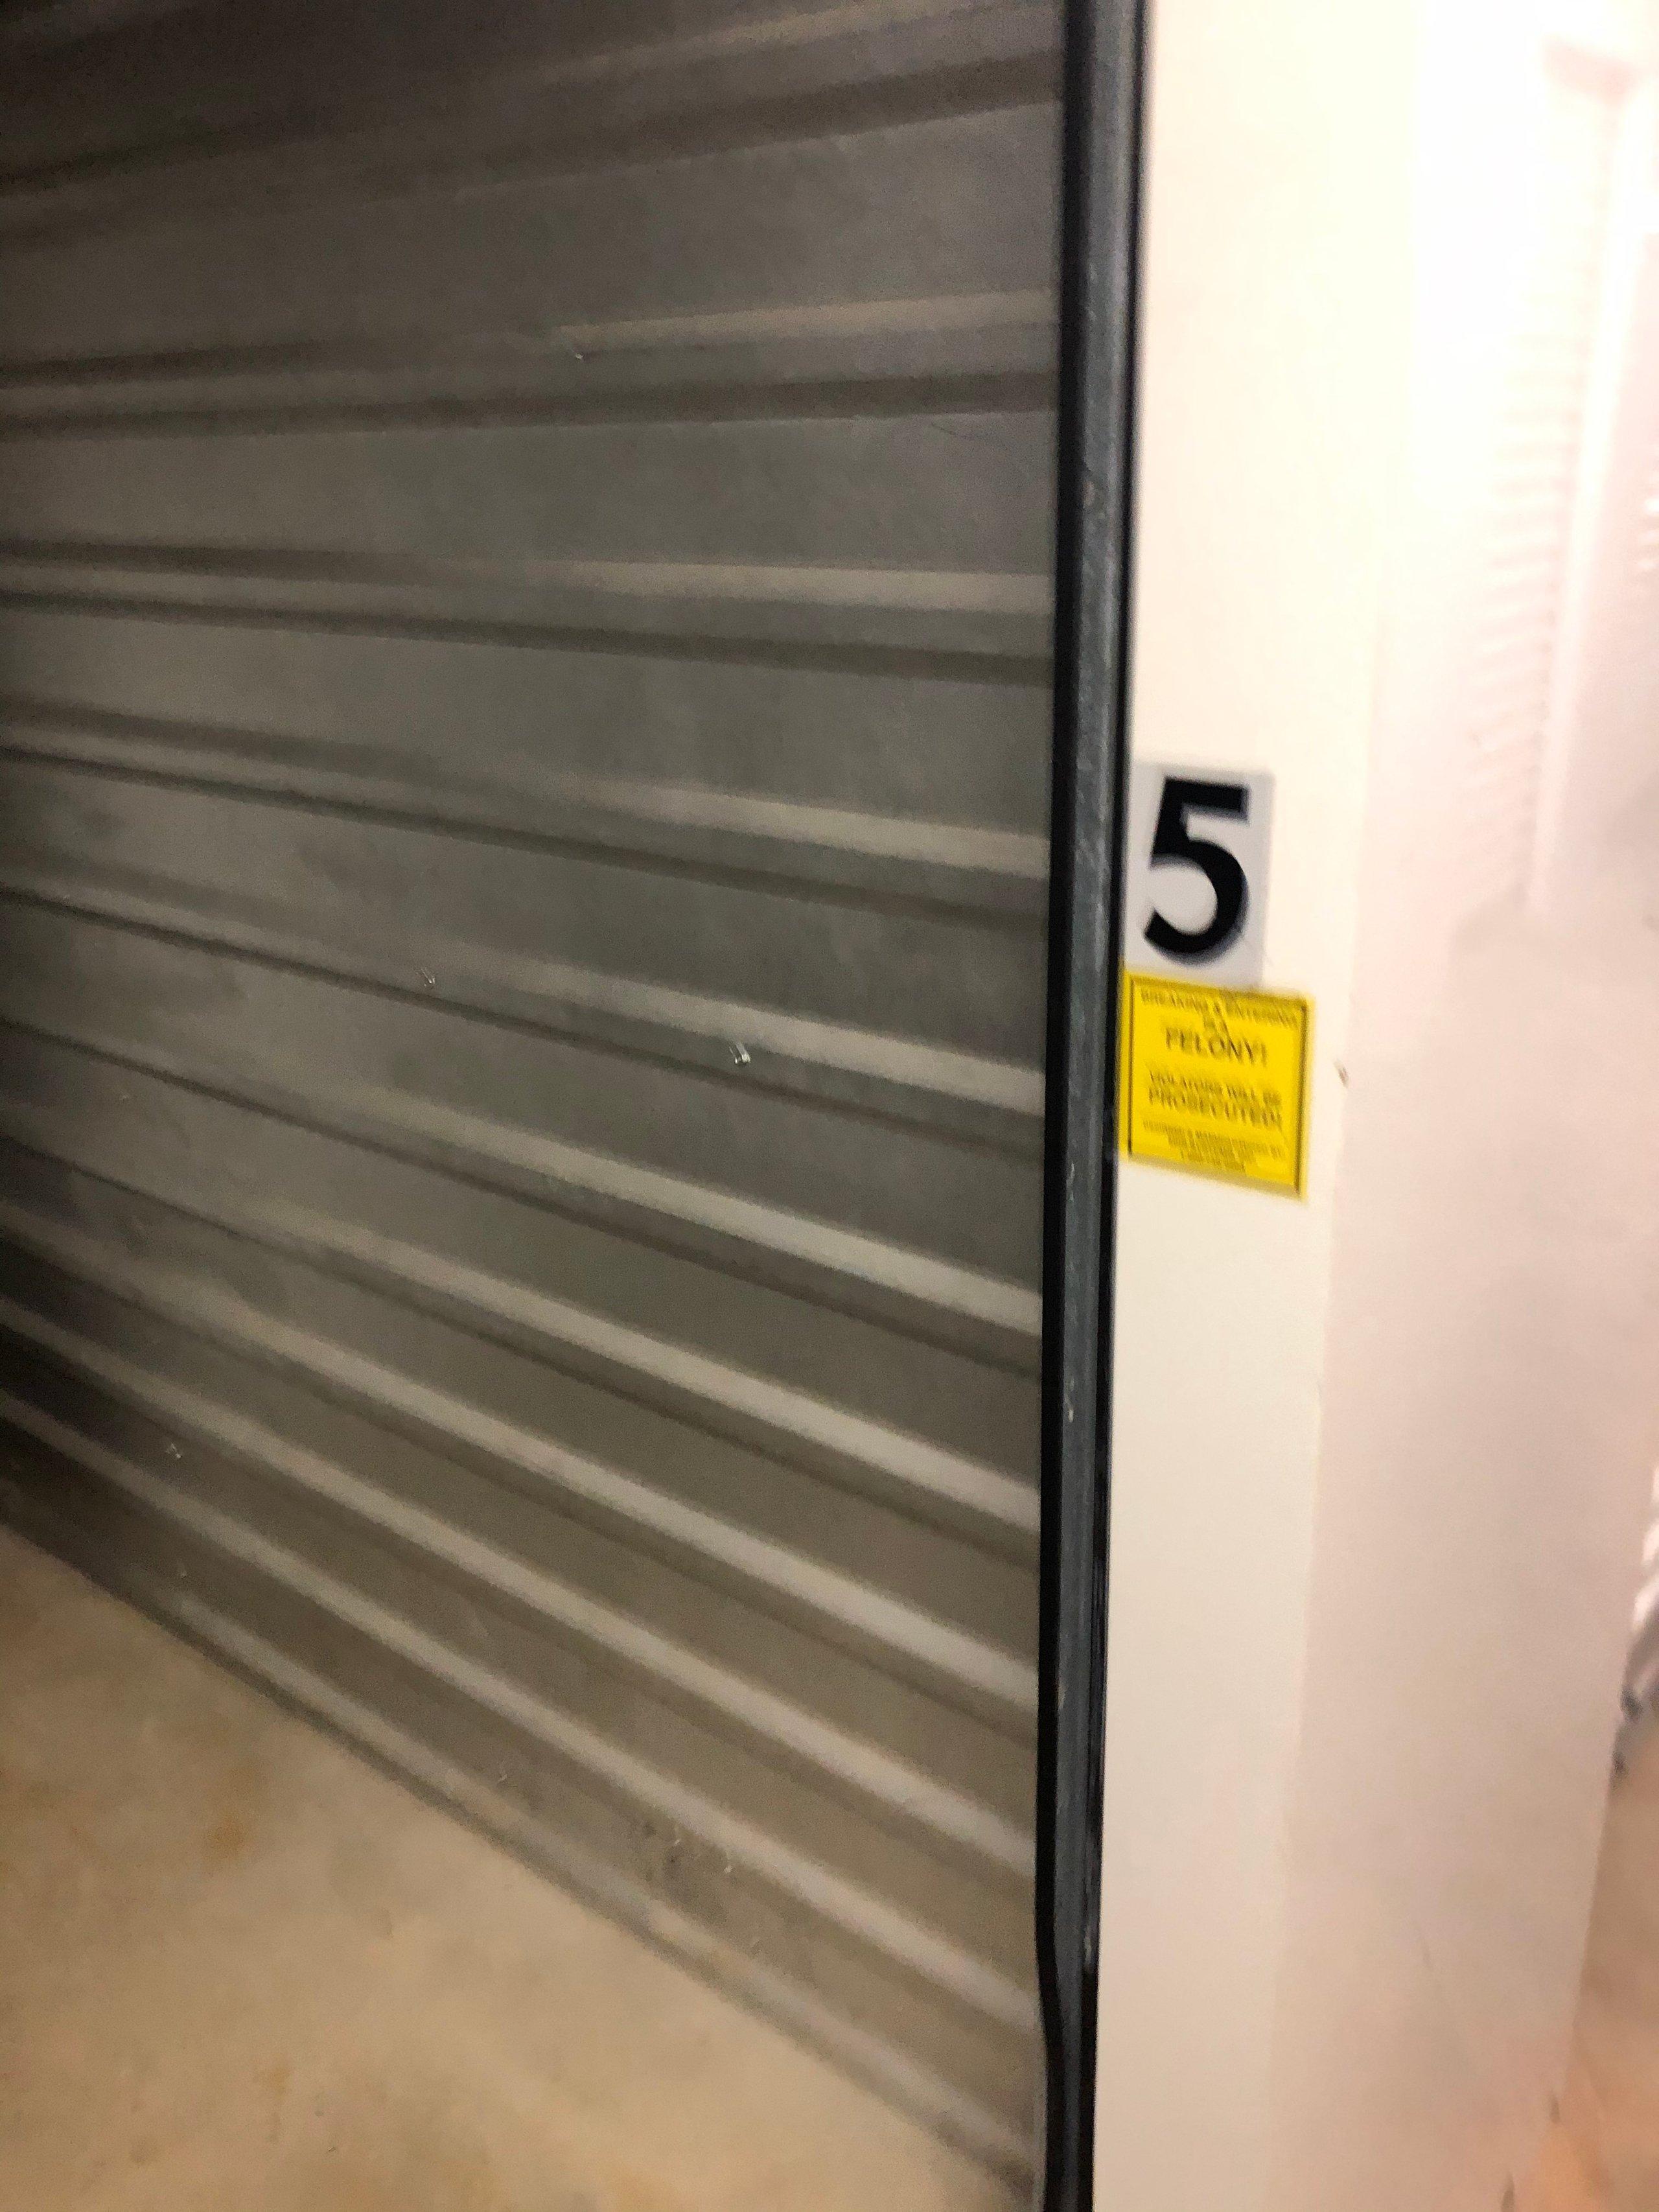 40x80 Unpaved Lot self storage unit